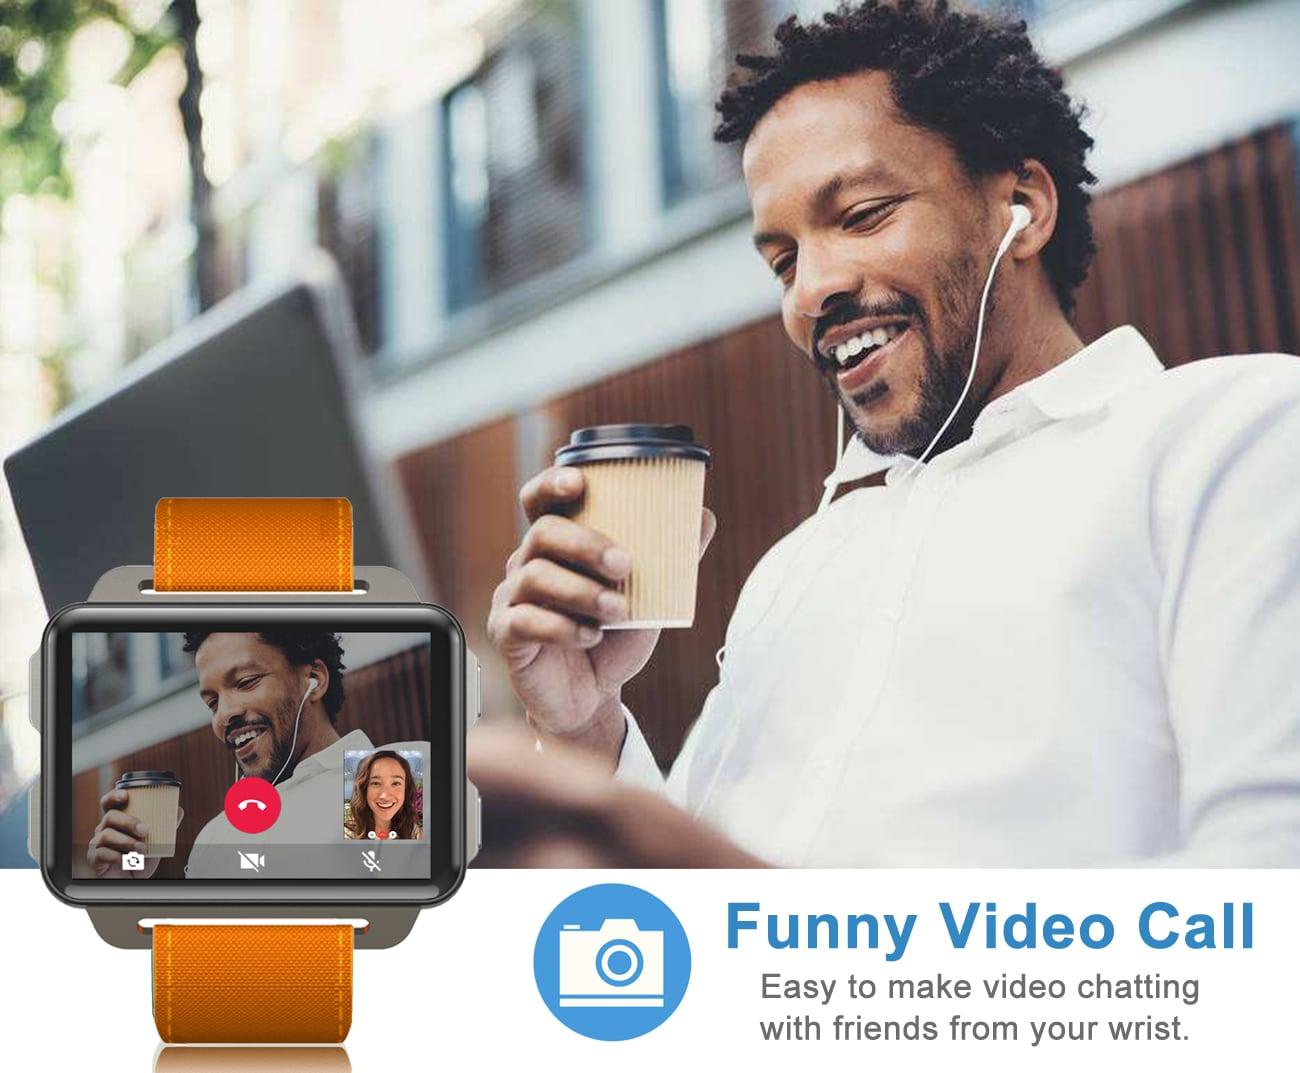 LEMFO LEM4 Pro 2.2 Inch Display 3G Smart Watch Android 5.1 1200mAh Lithium Battery 1GB + 16GB Wifi Take Video Orange - 9